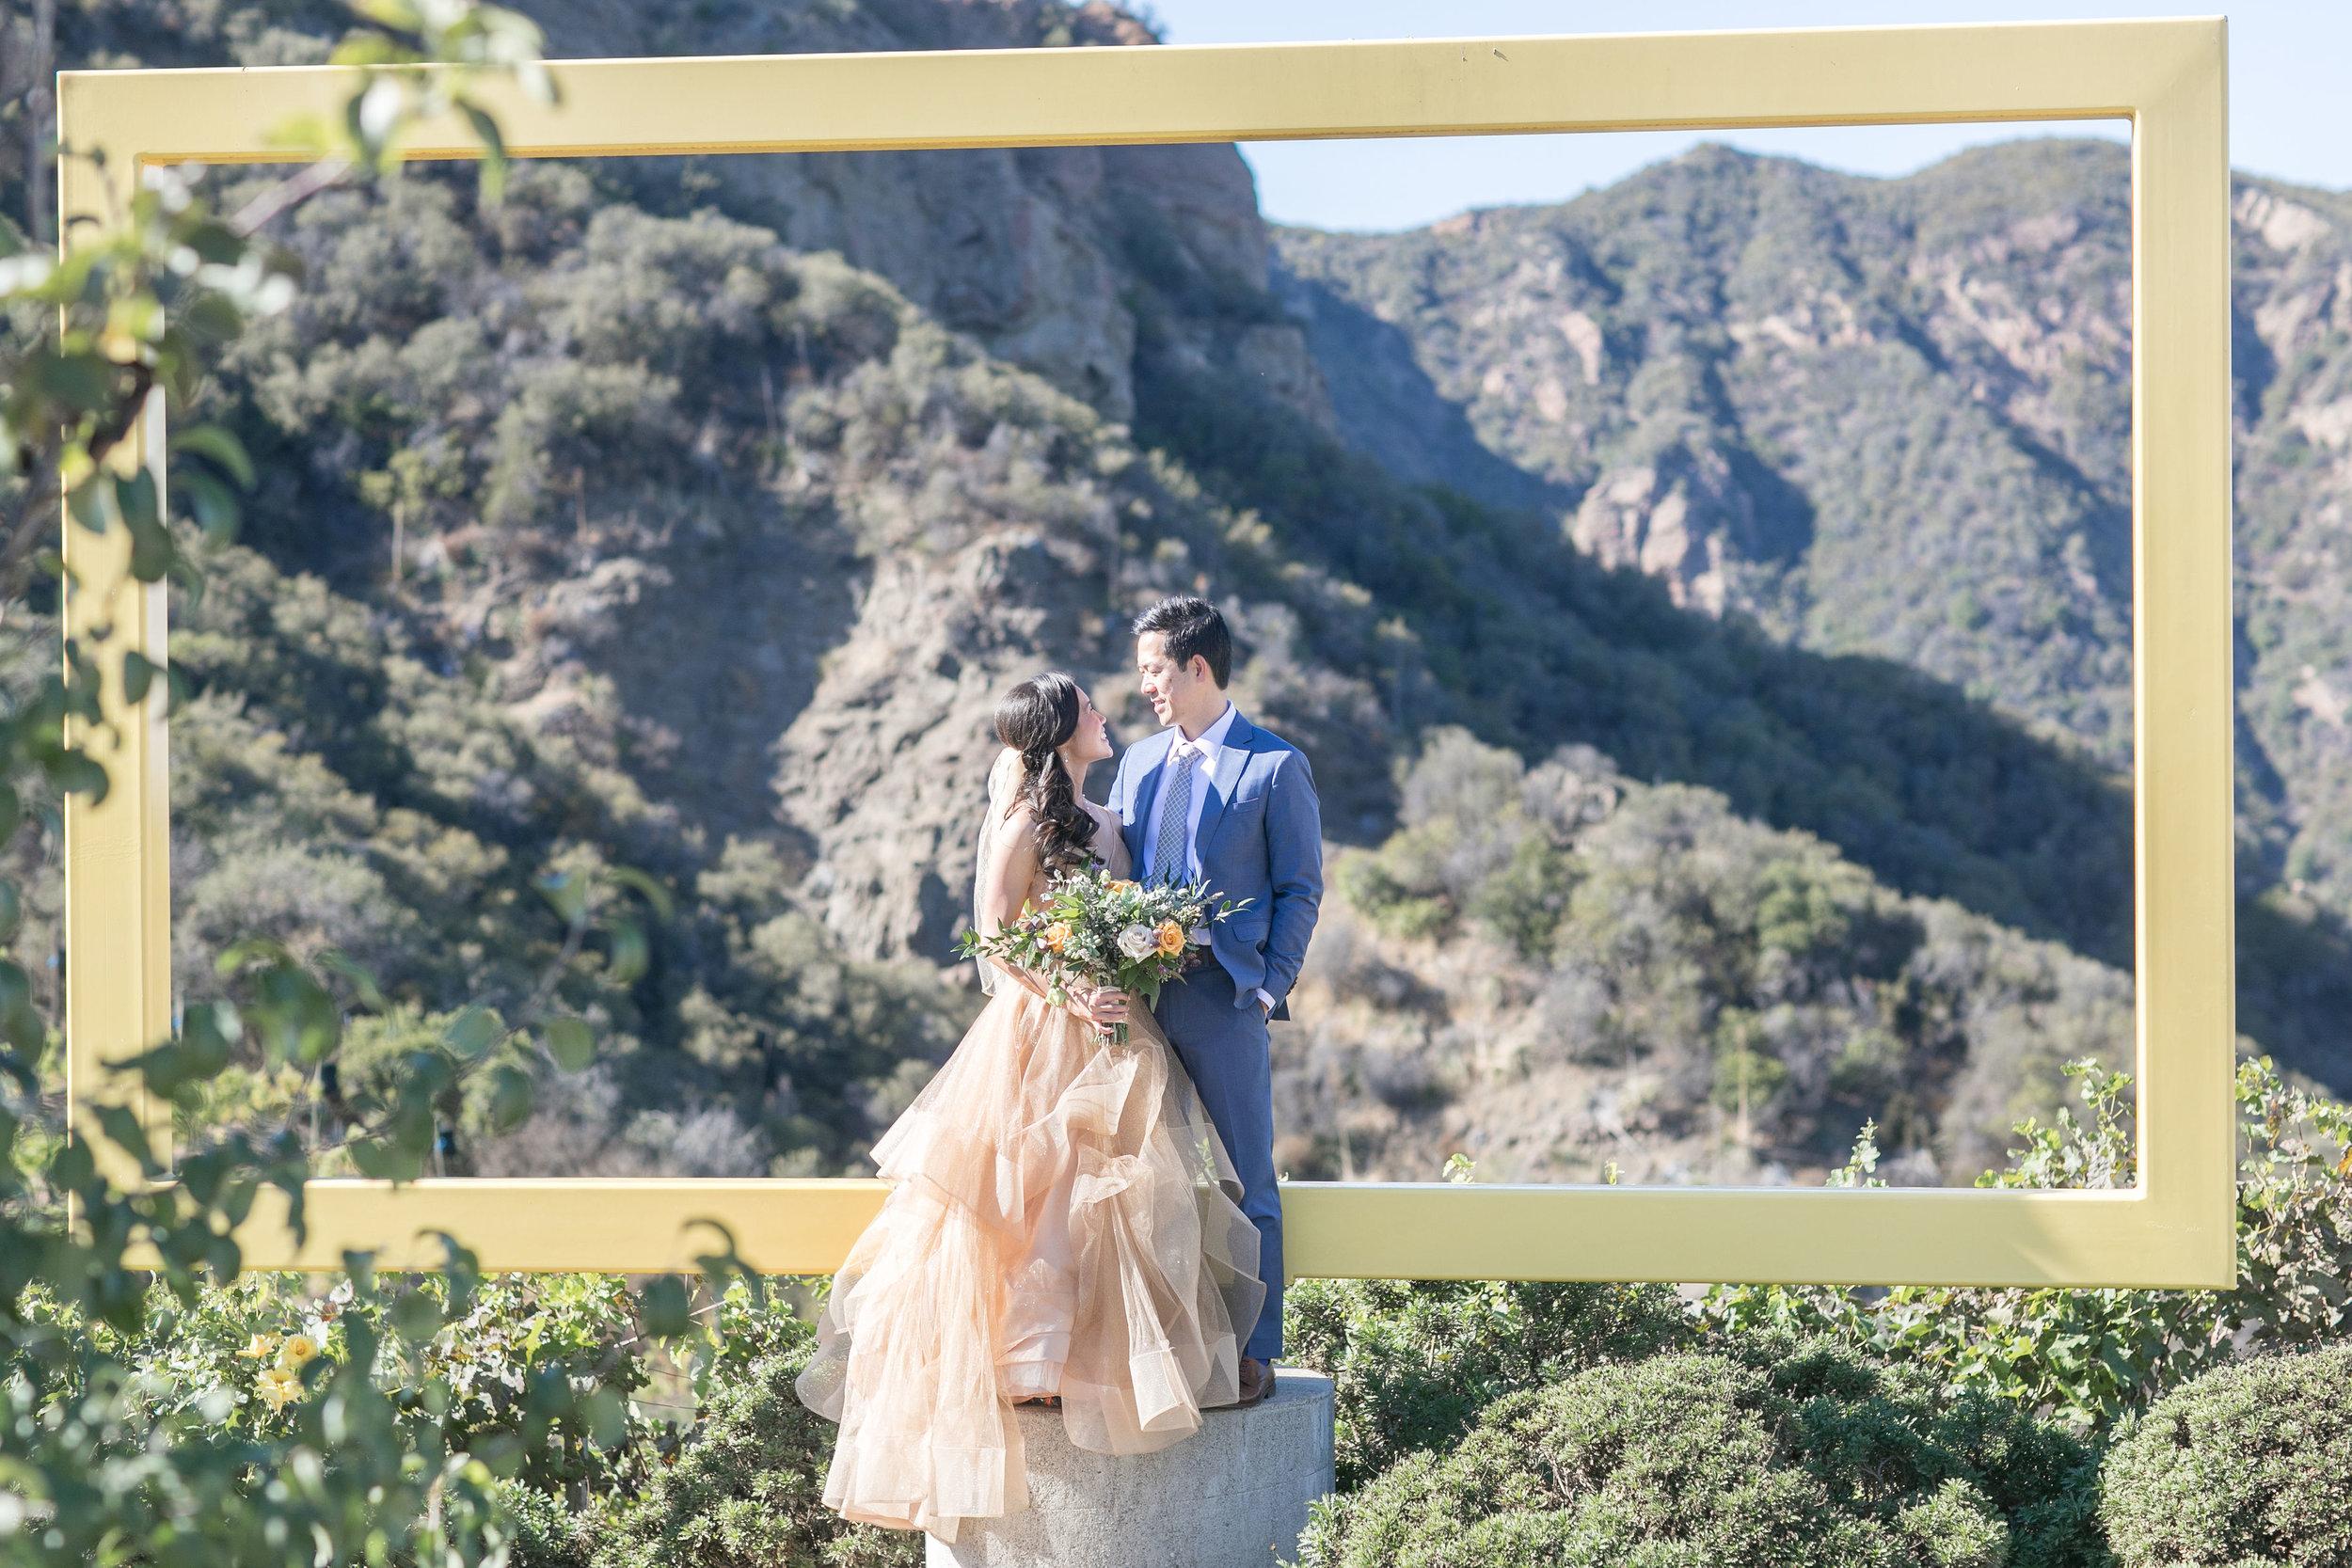 Melanie+Seiji-saddlerockranch-malibucaliforniawedding-couplesportraitsandweddingparty-0215.jpg